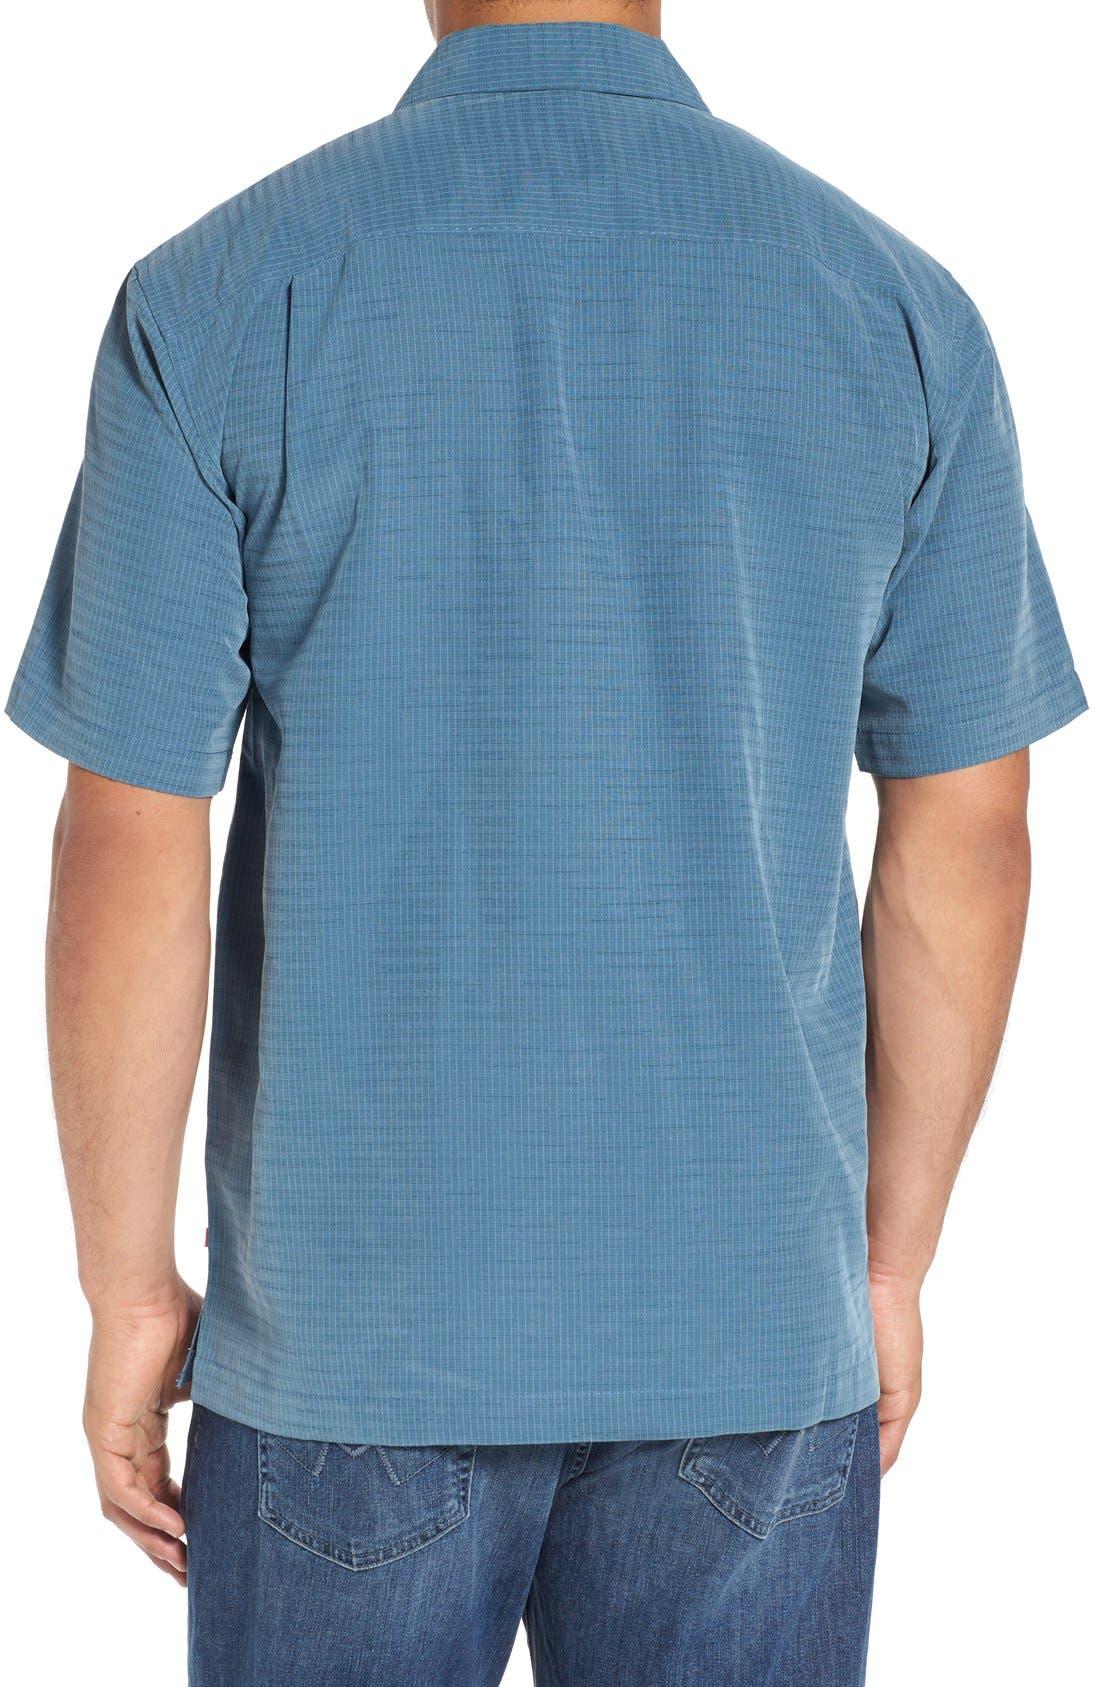 'Centinela 4' Short Sleeve Sport Shirt,                             Alternate thumbnail 64, color,